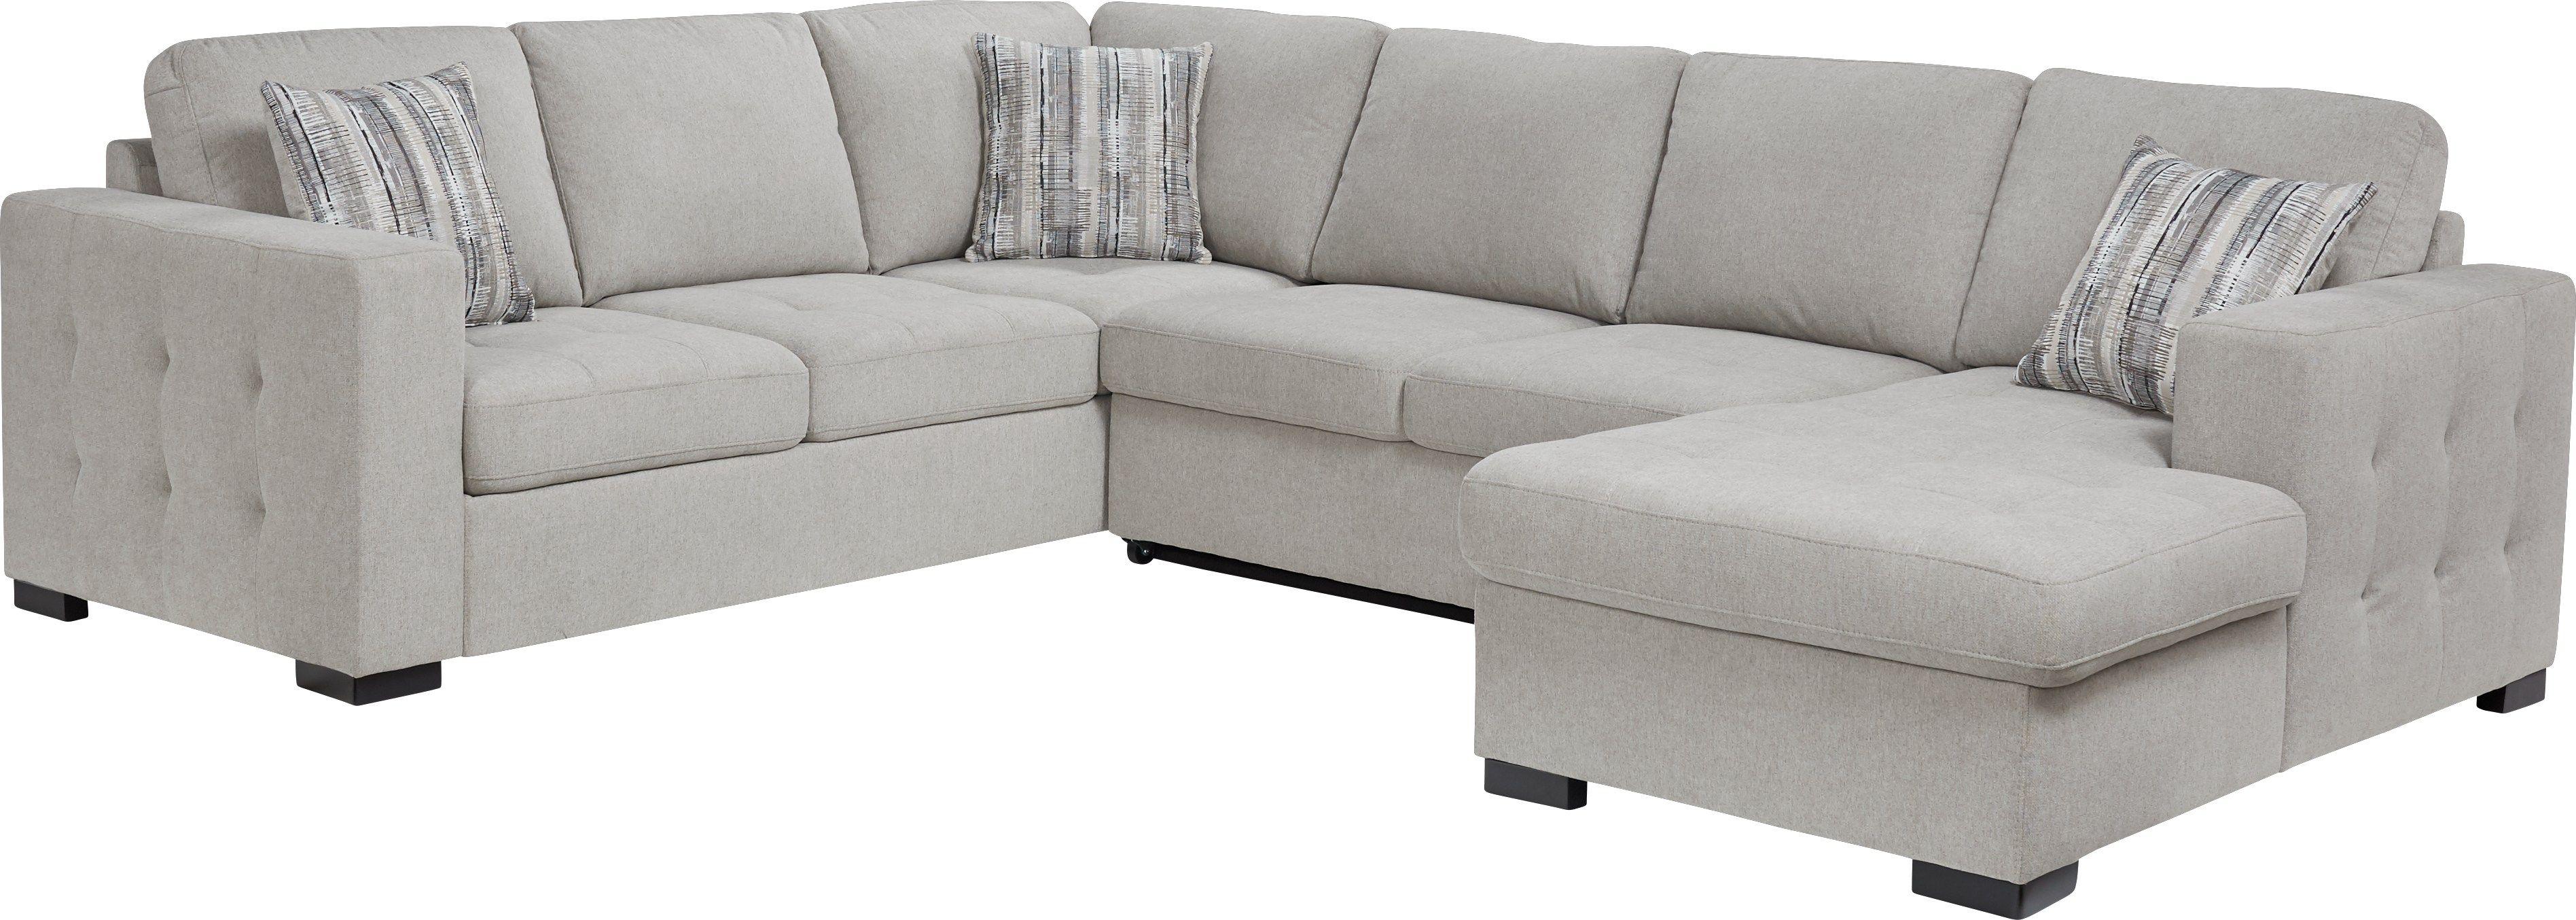 Ridgewater Graphite Sofa Rooms To Go Sofa 82 Long Love Seat